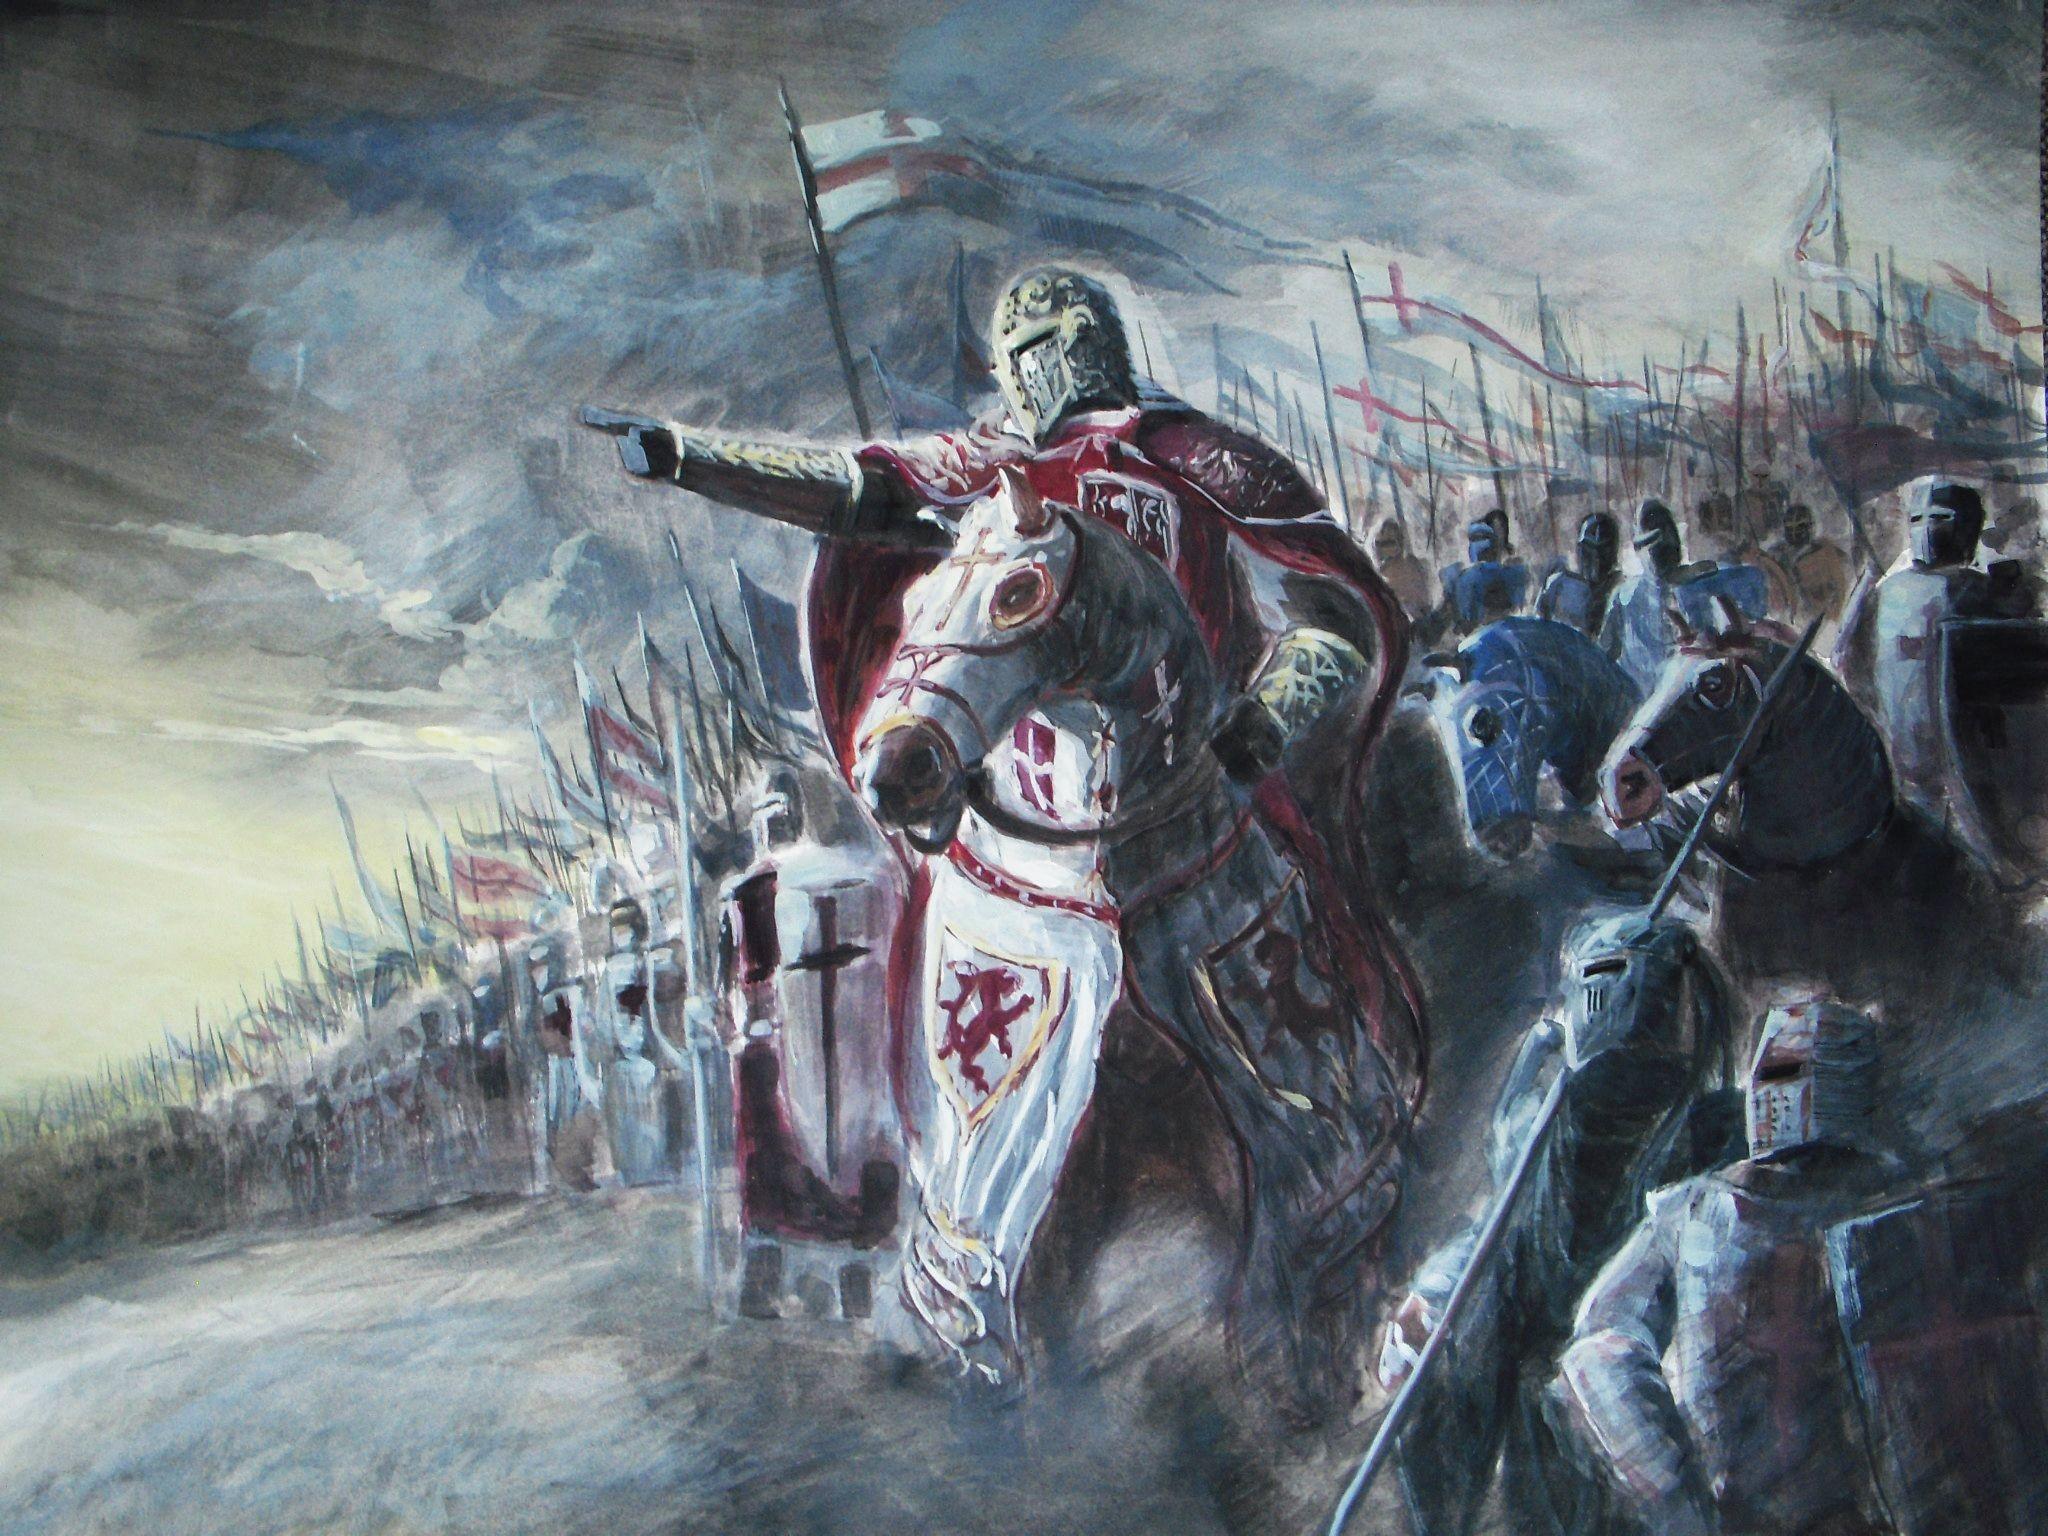 72 Knights Templar Wallpapers on WallpaperPlay 2048x1536